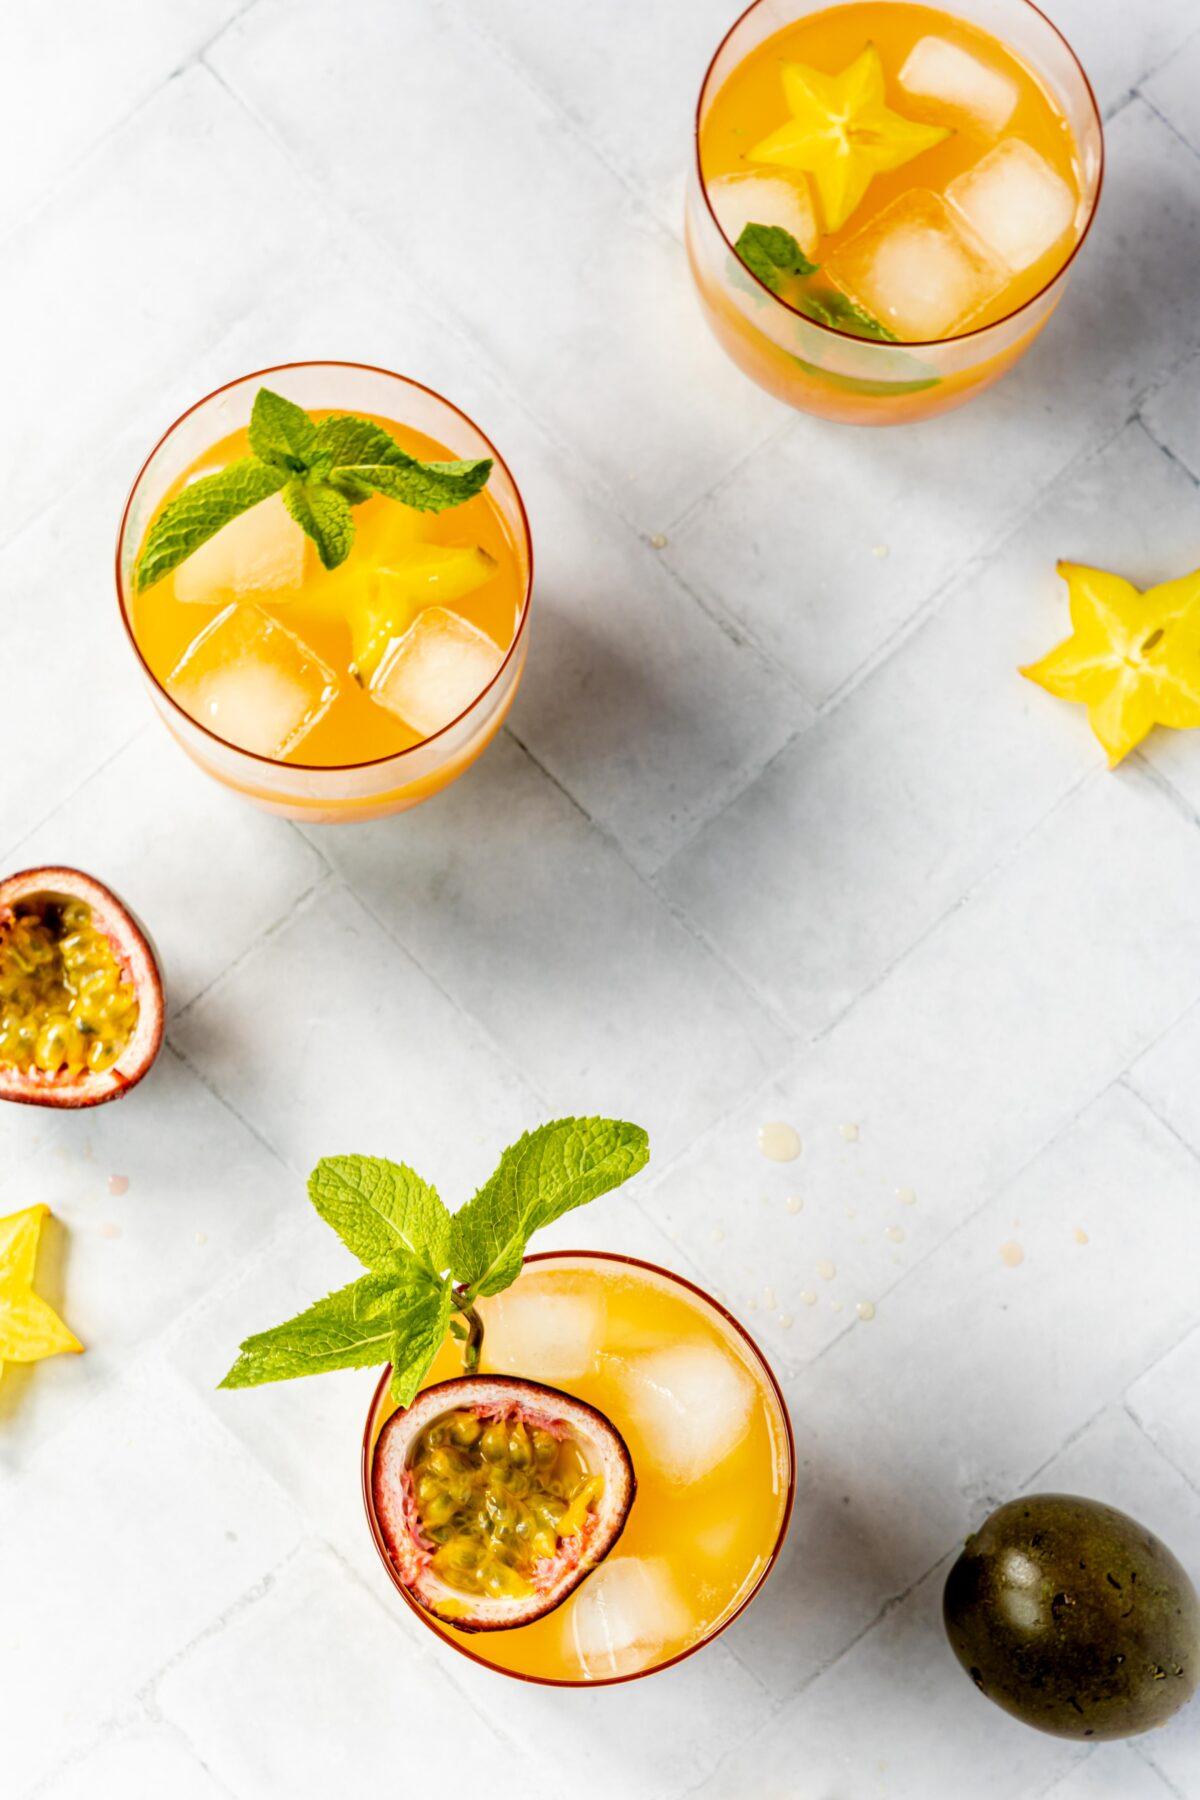 Maracuja Kokos Drink // Summer Coconut and passion fruit Drink by https://babyrockmyday.com/maracuja-kokos-drink/